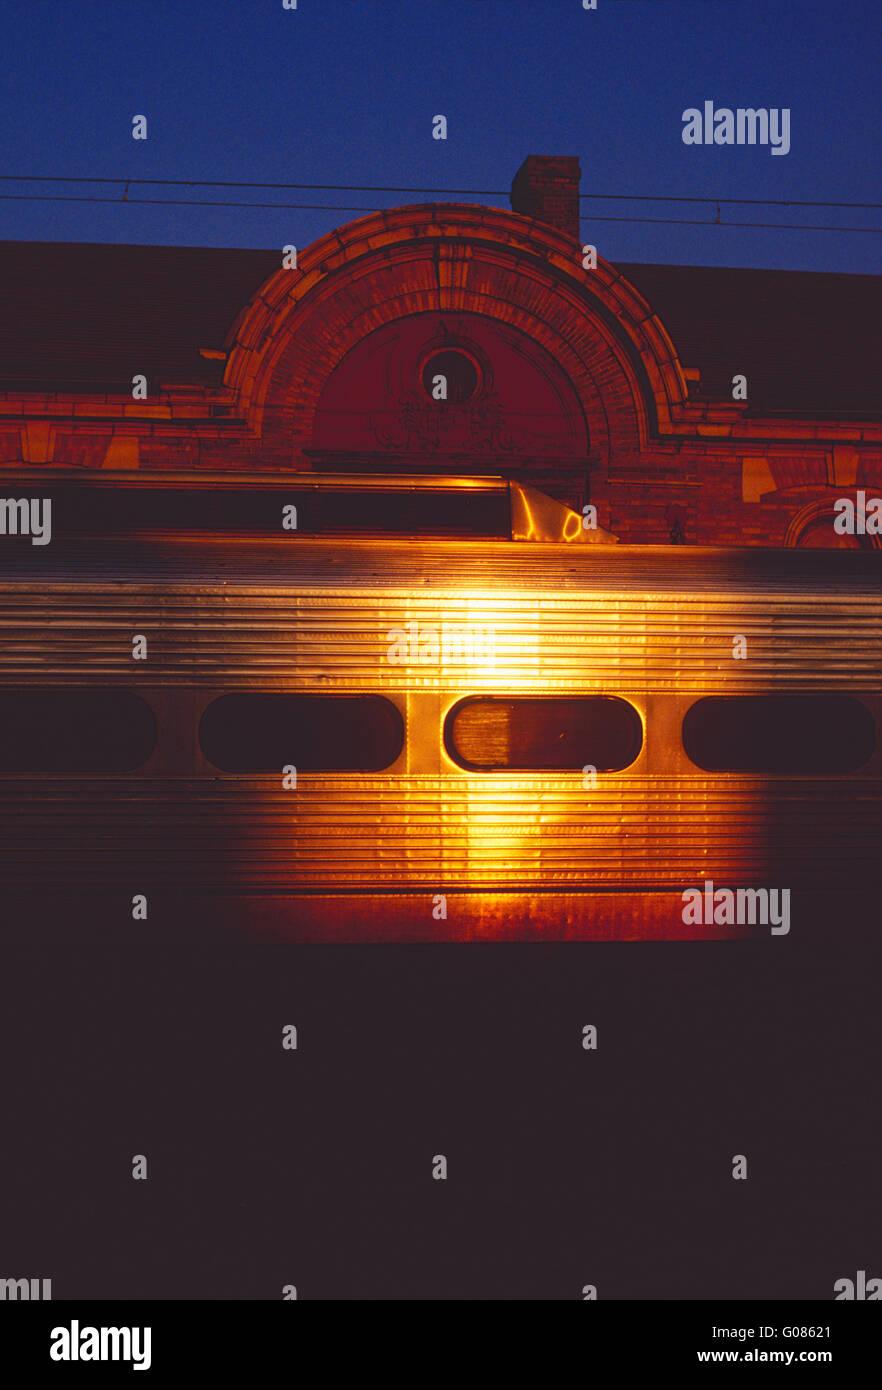 Setting sun reflects off of SEPTA commuter train car - Stock Image